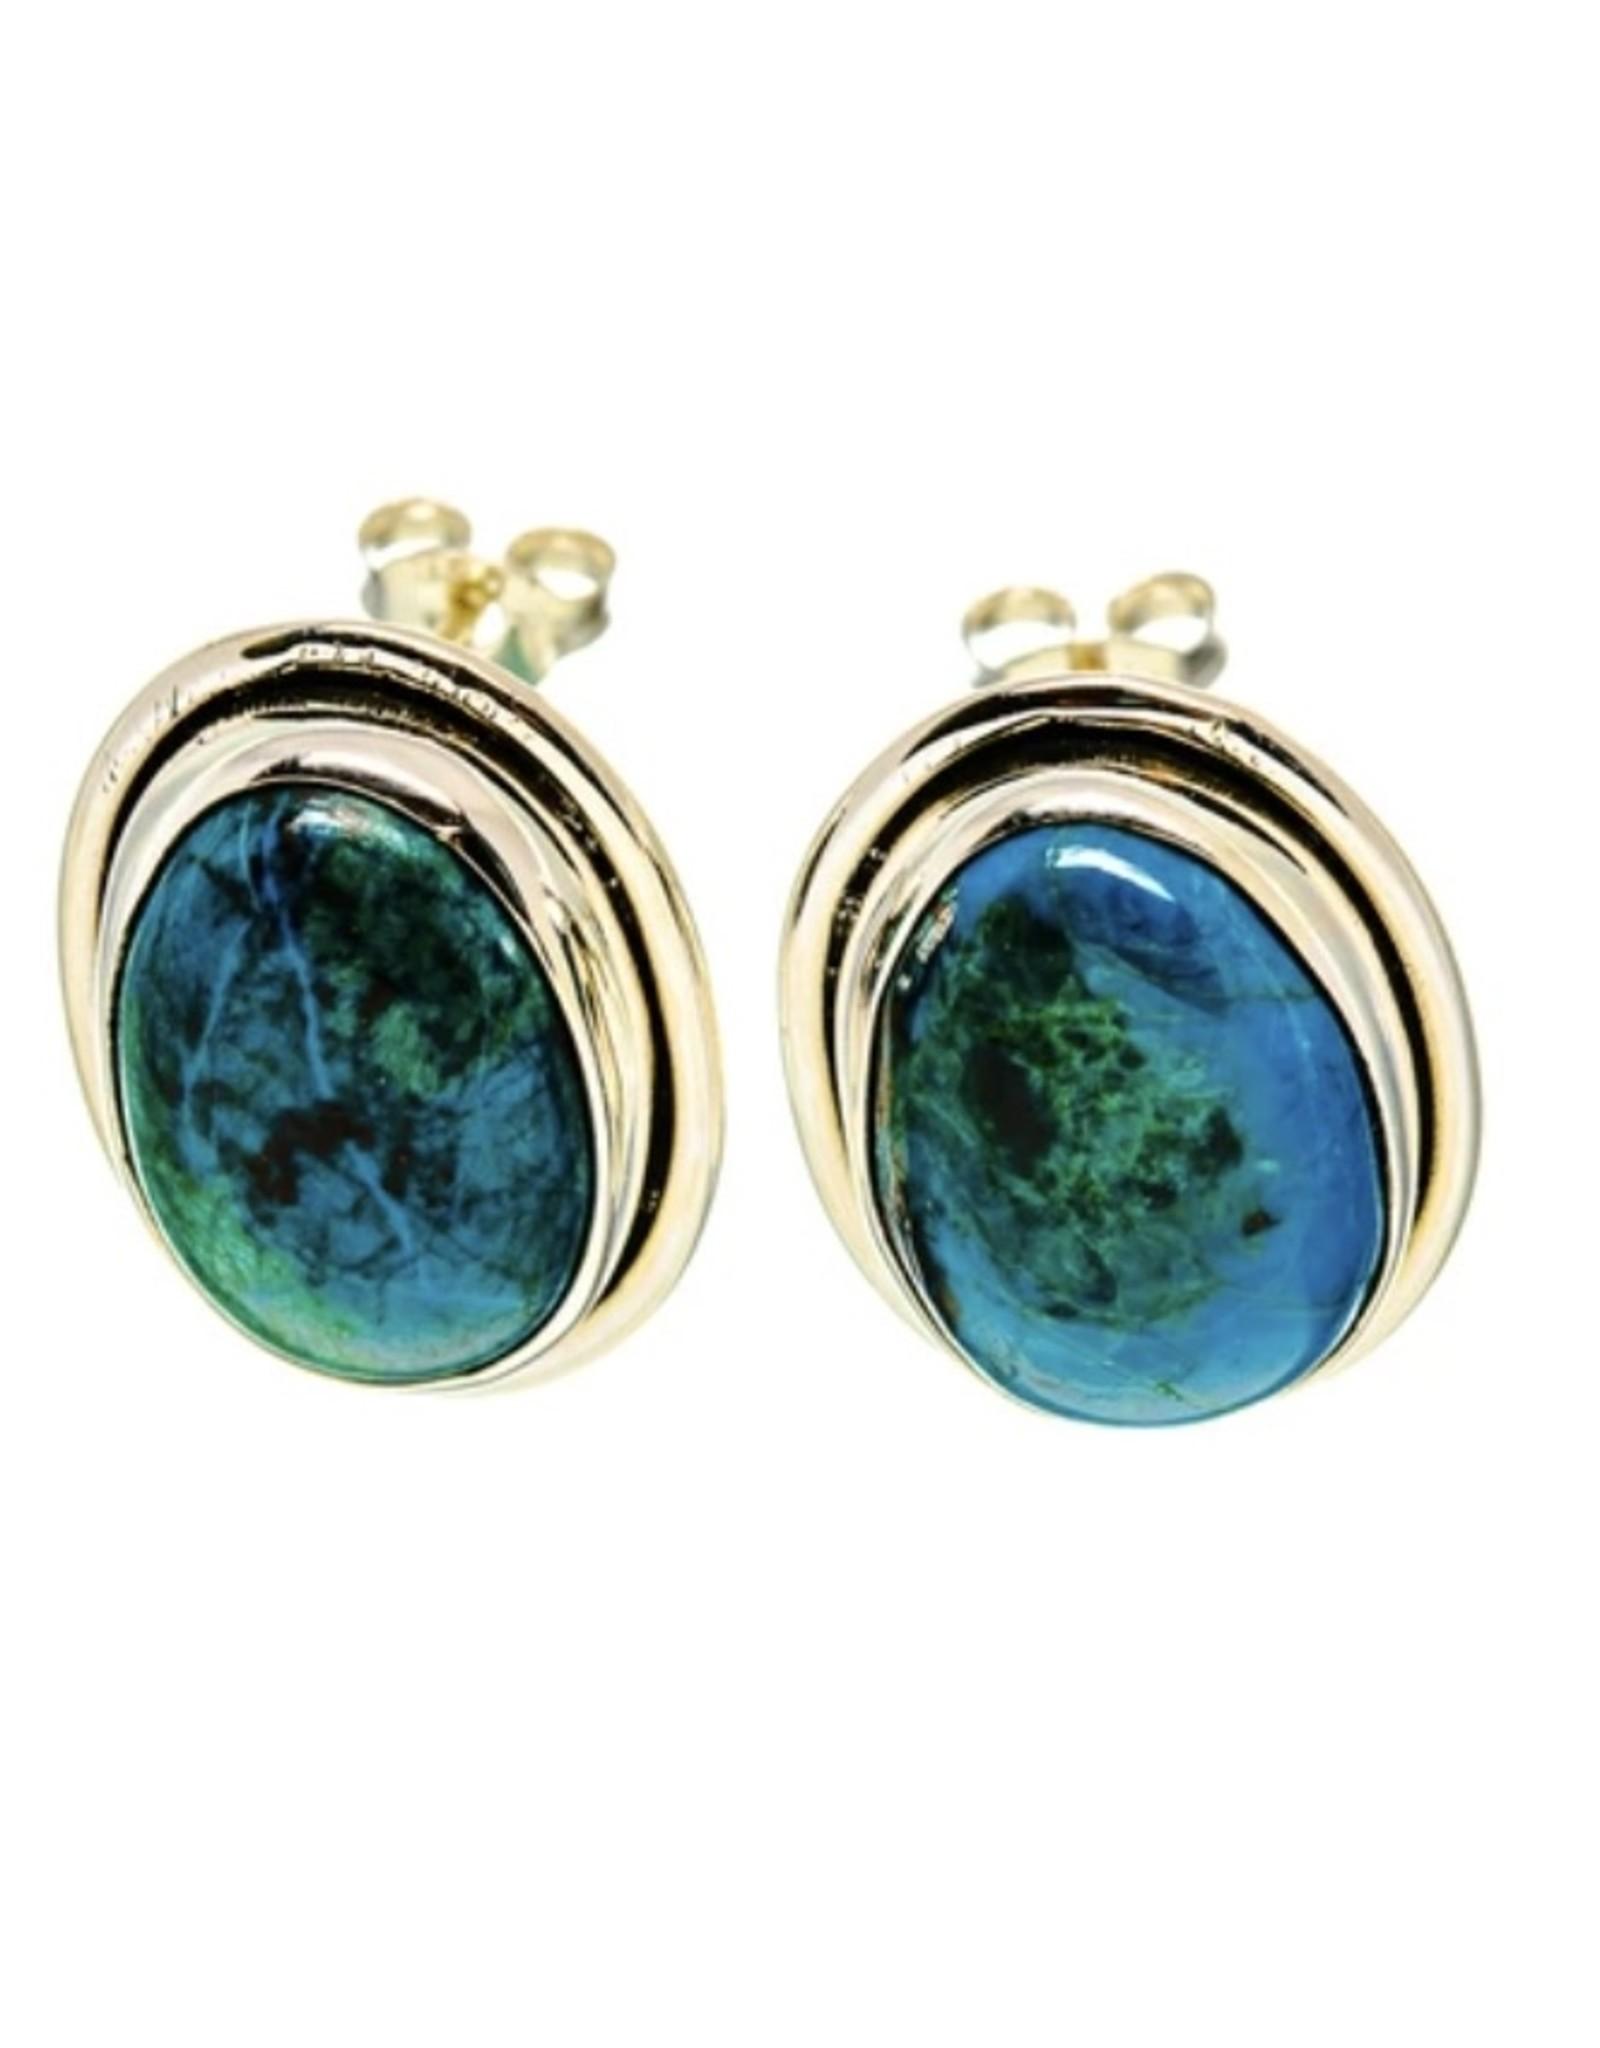 Chrysocolla Earrings - Stud